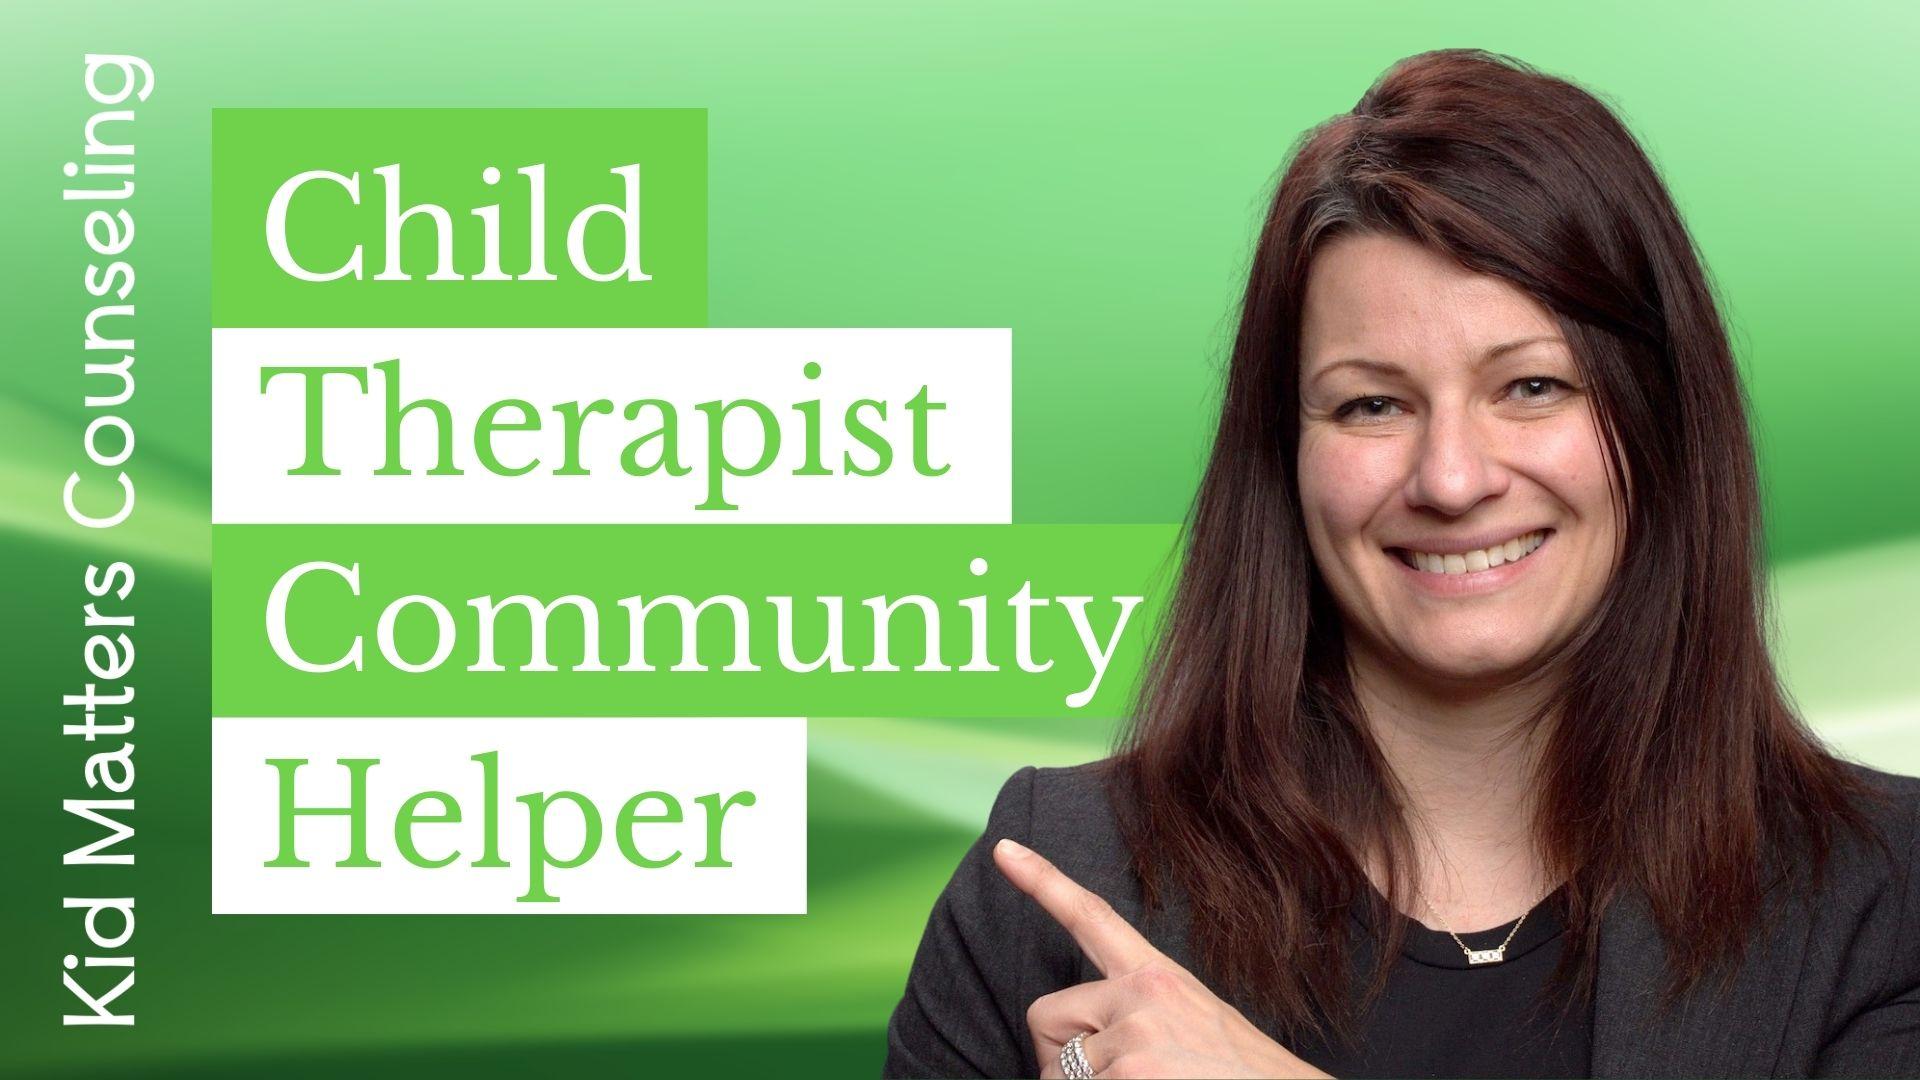 Child Therapist Community Helper